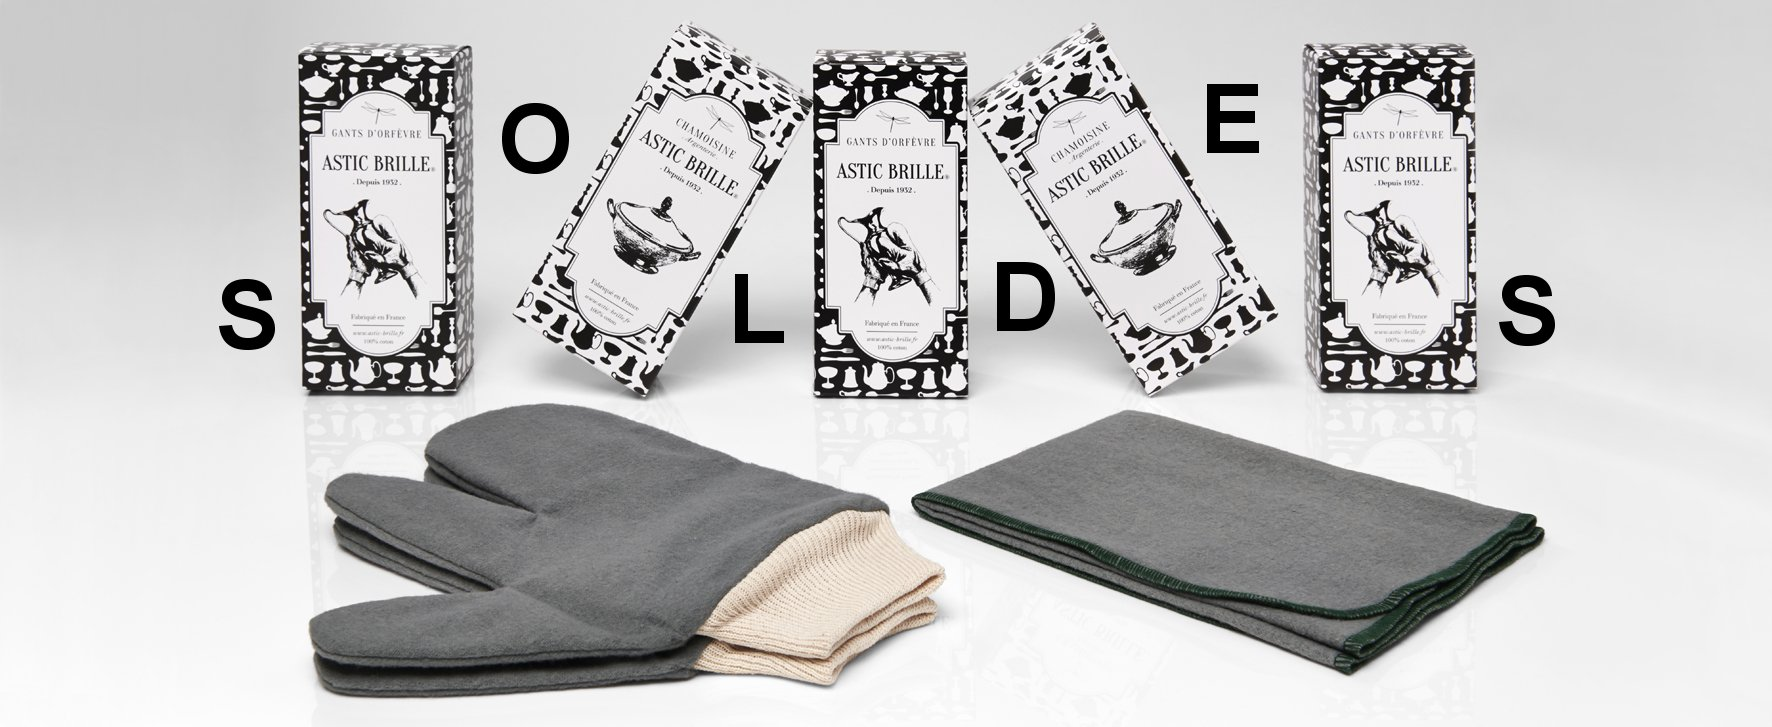 gants orfevre et argenterie Astic Brille SOLDES